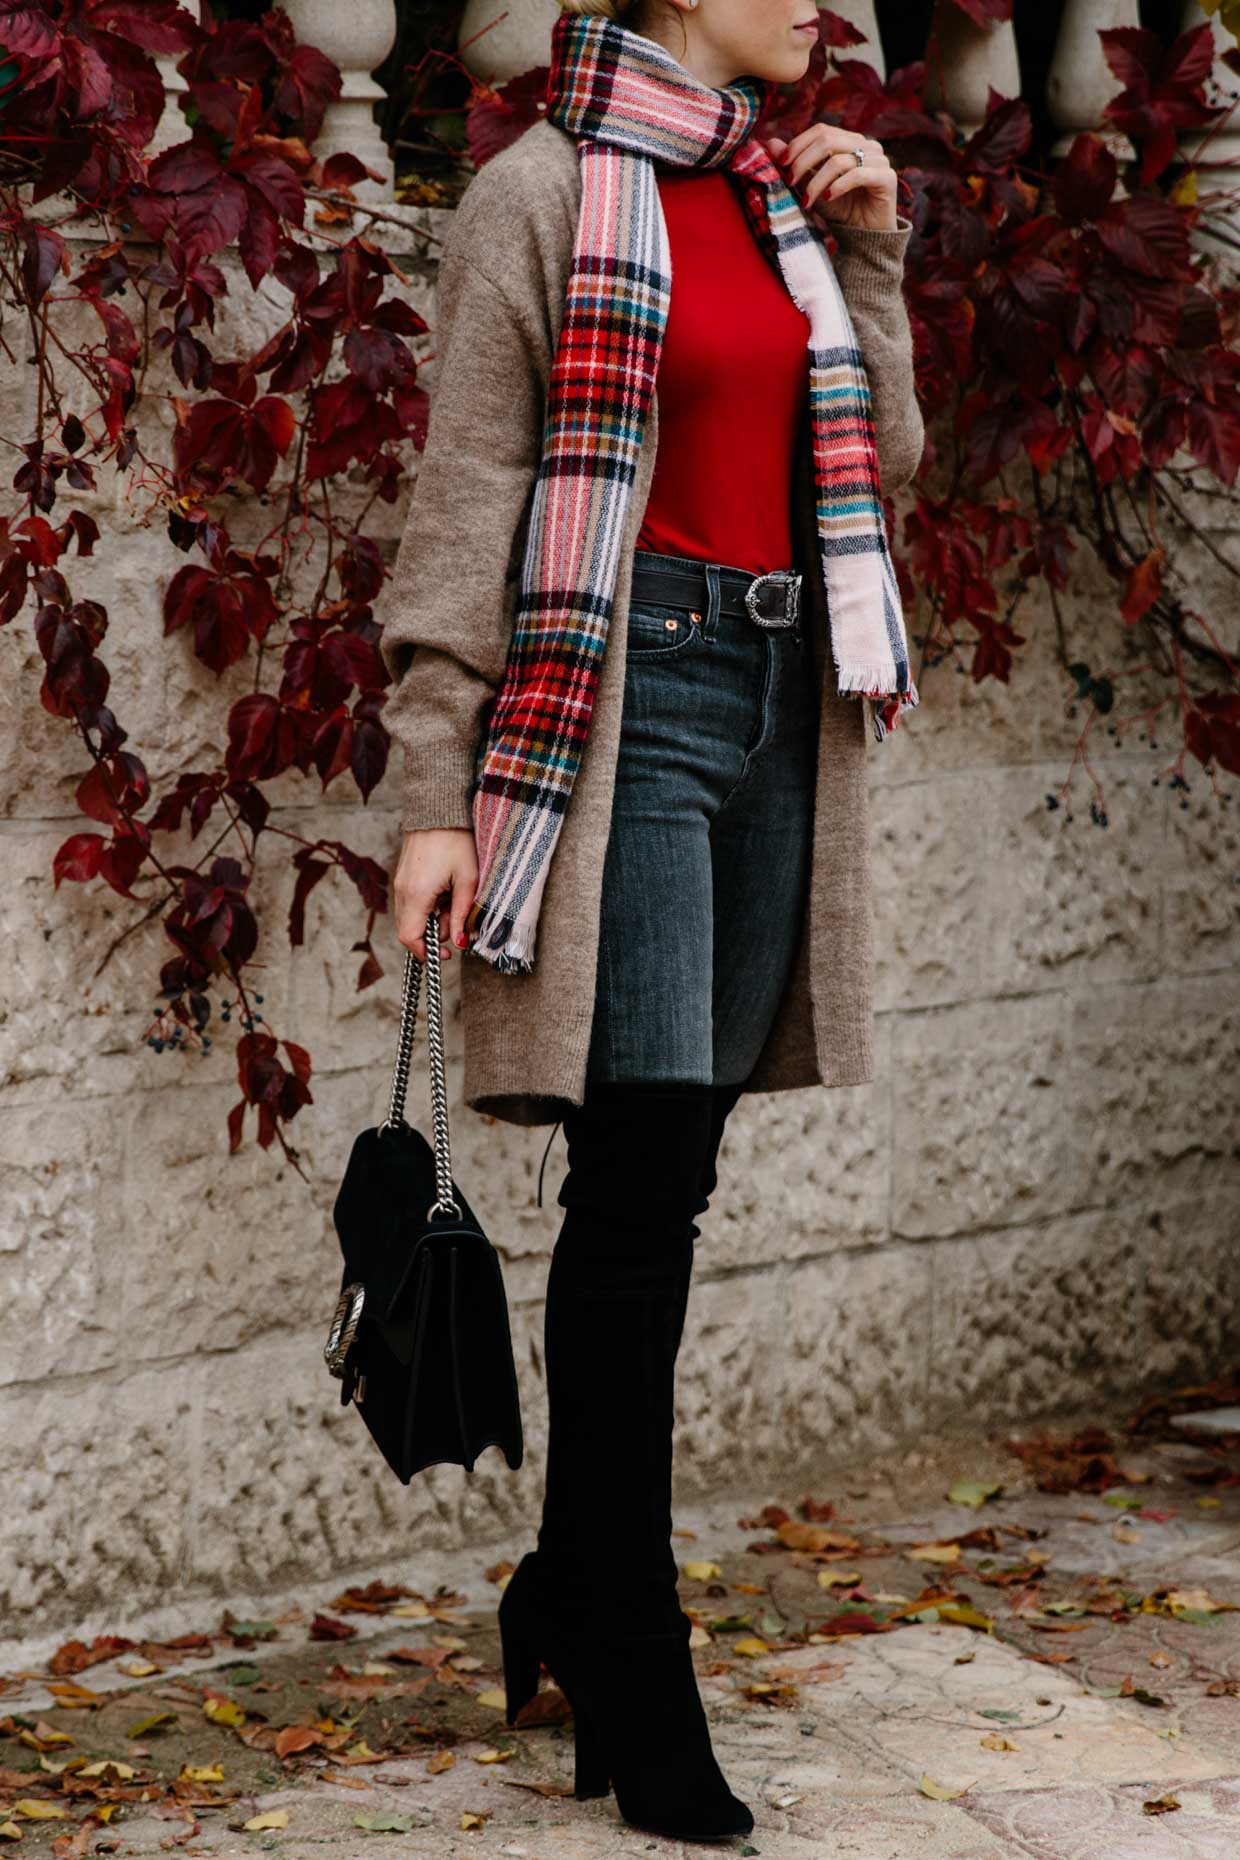 c63f0aea300 Meagan Brandon fashion blogger of Meagan s Moda wears red plaid scarf with  long tan cardigan